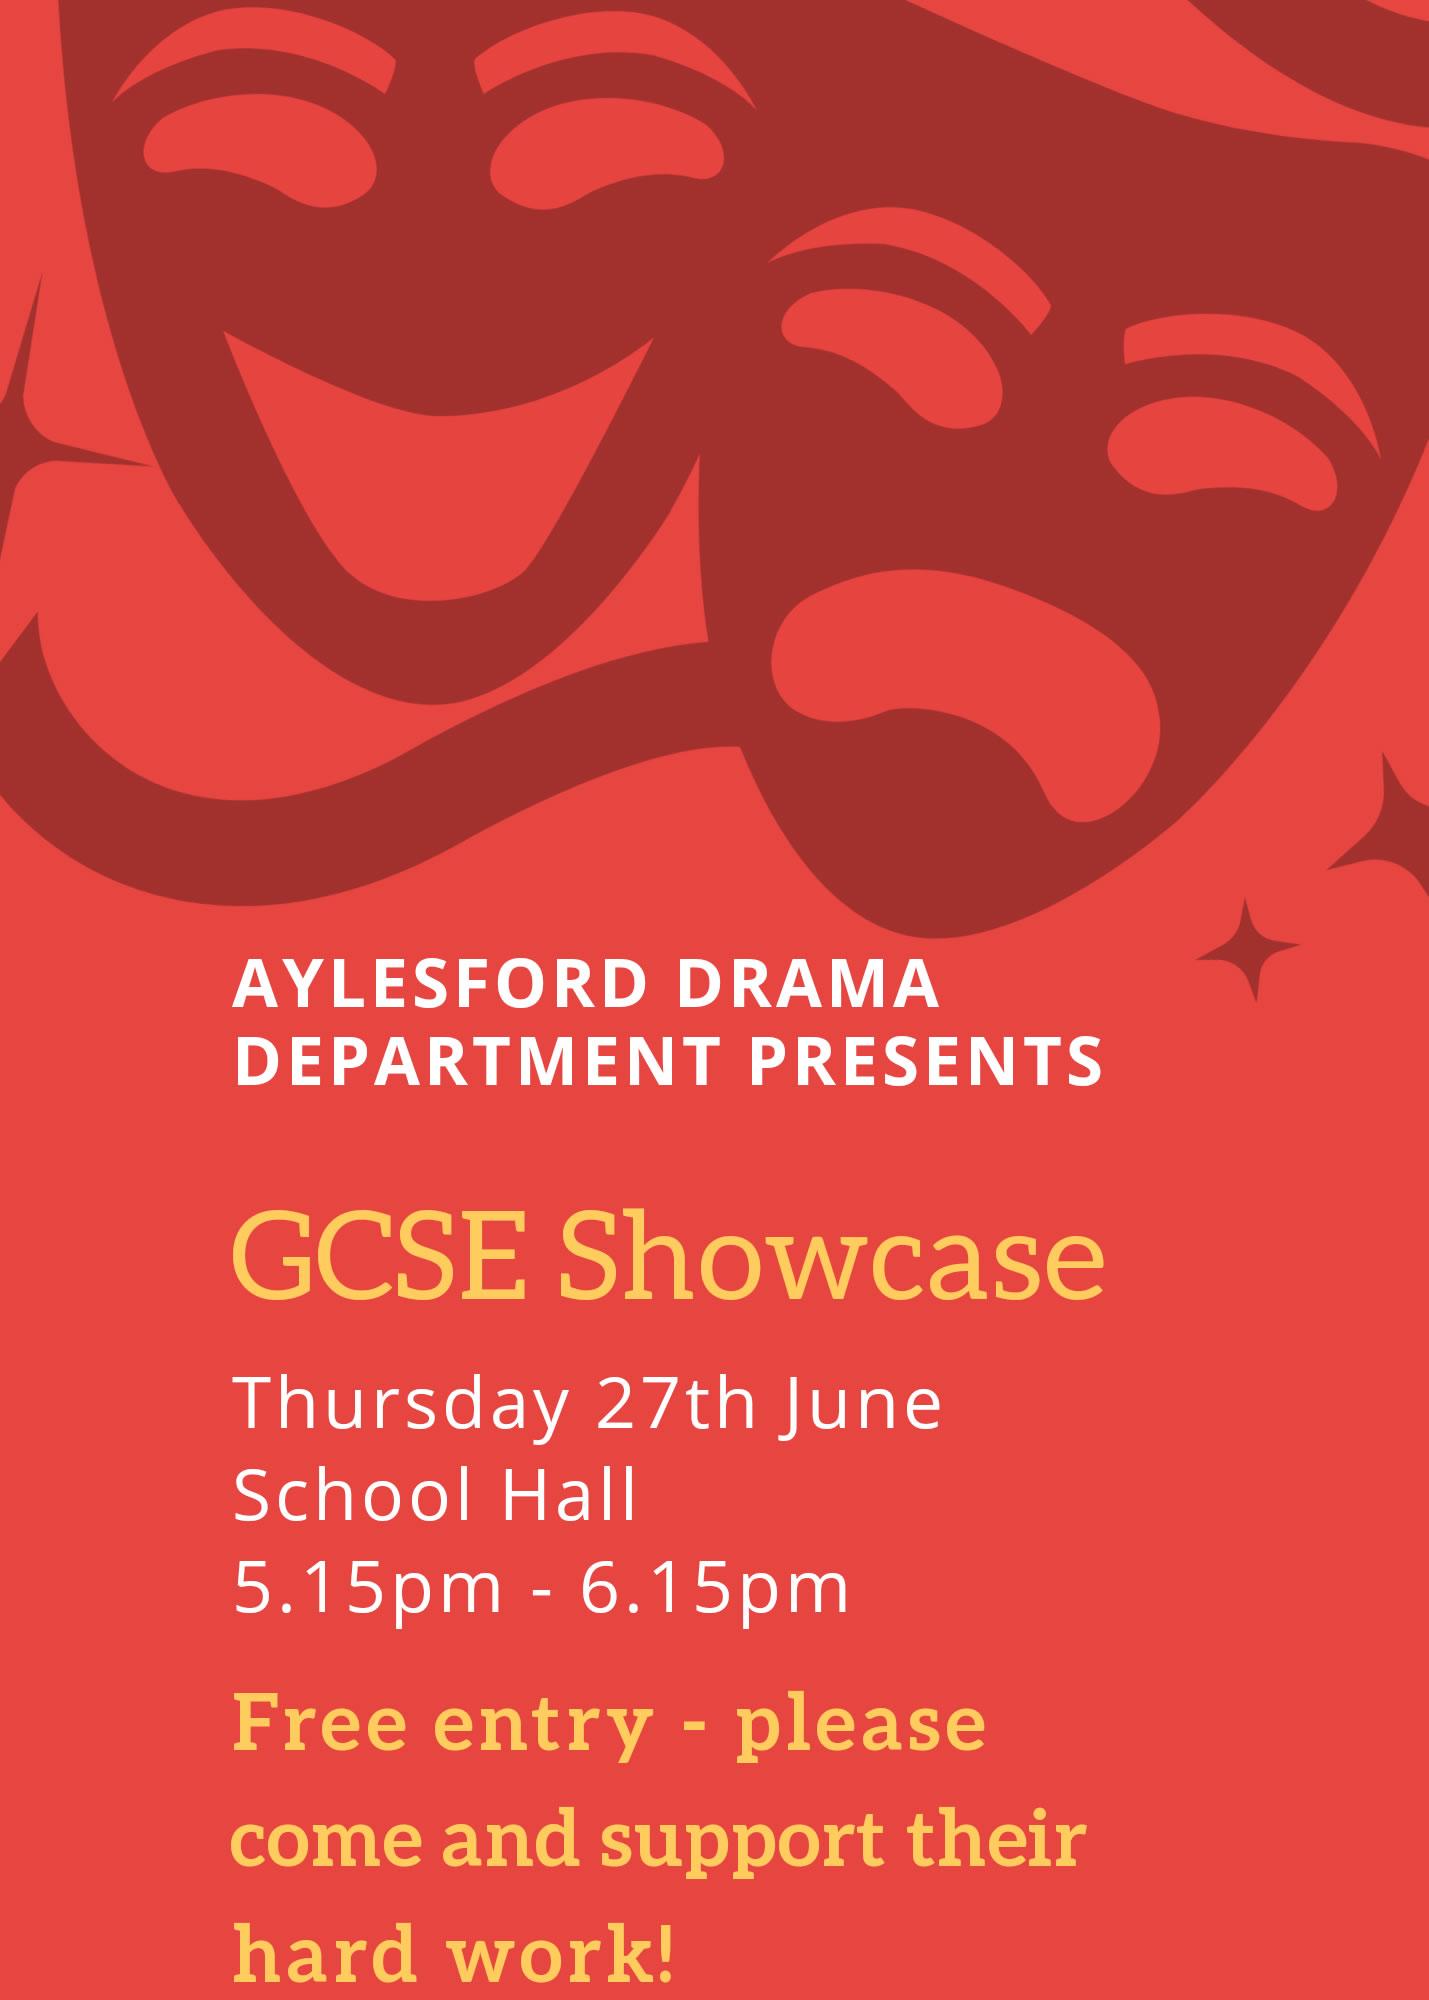 GCSE Drama Showcase - Thursday 27th June